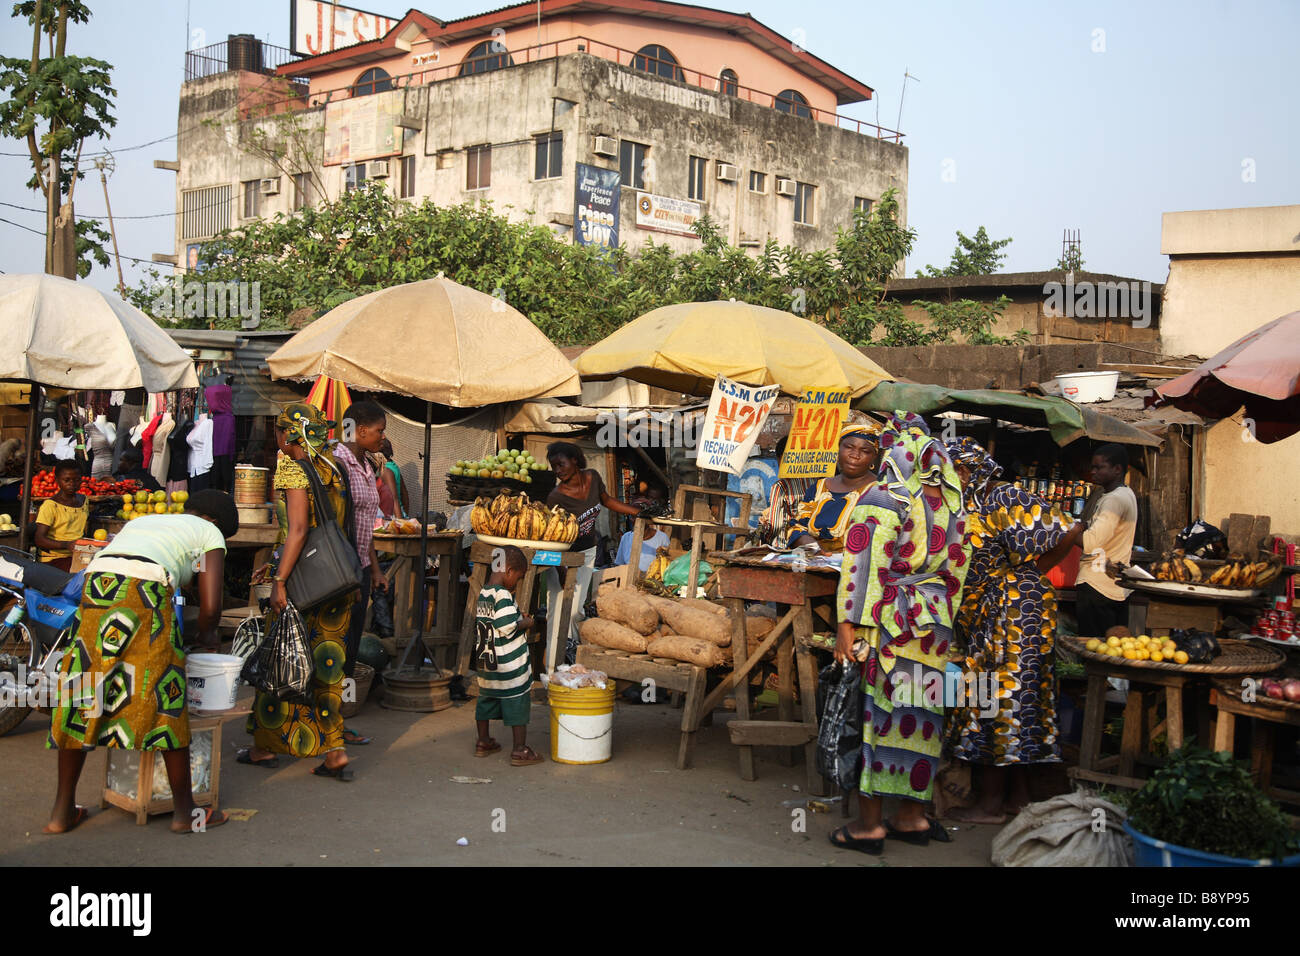 Street market in Lagos, Nigeria. - Stock Image